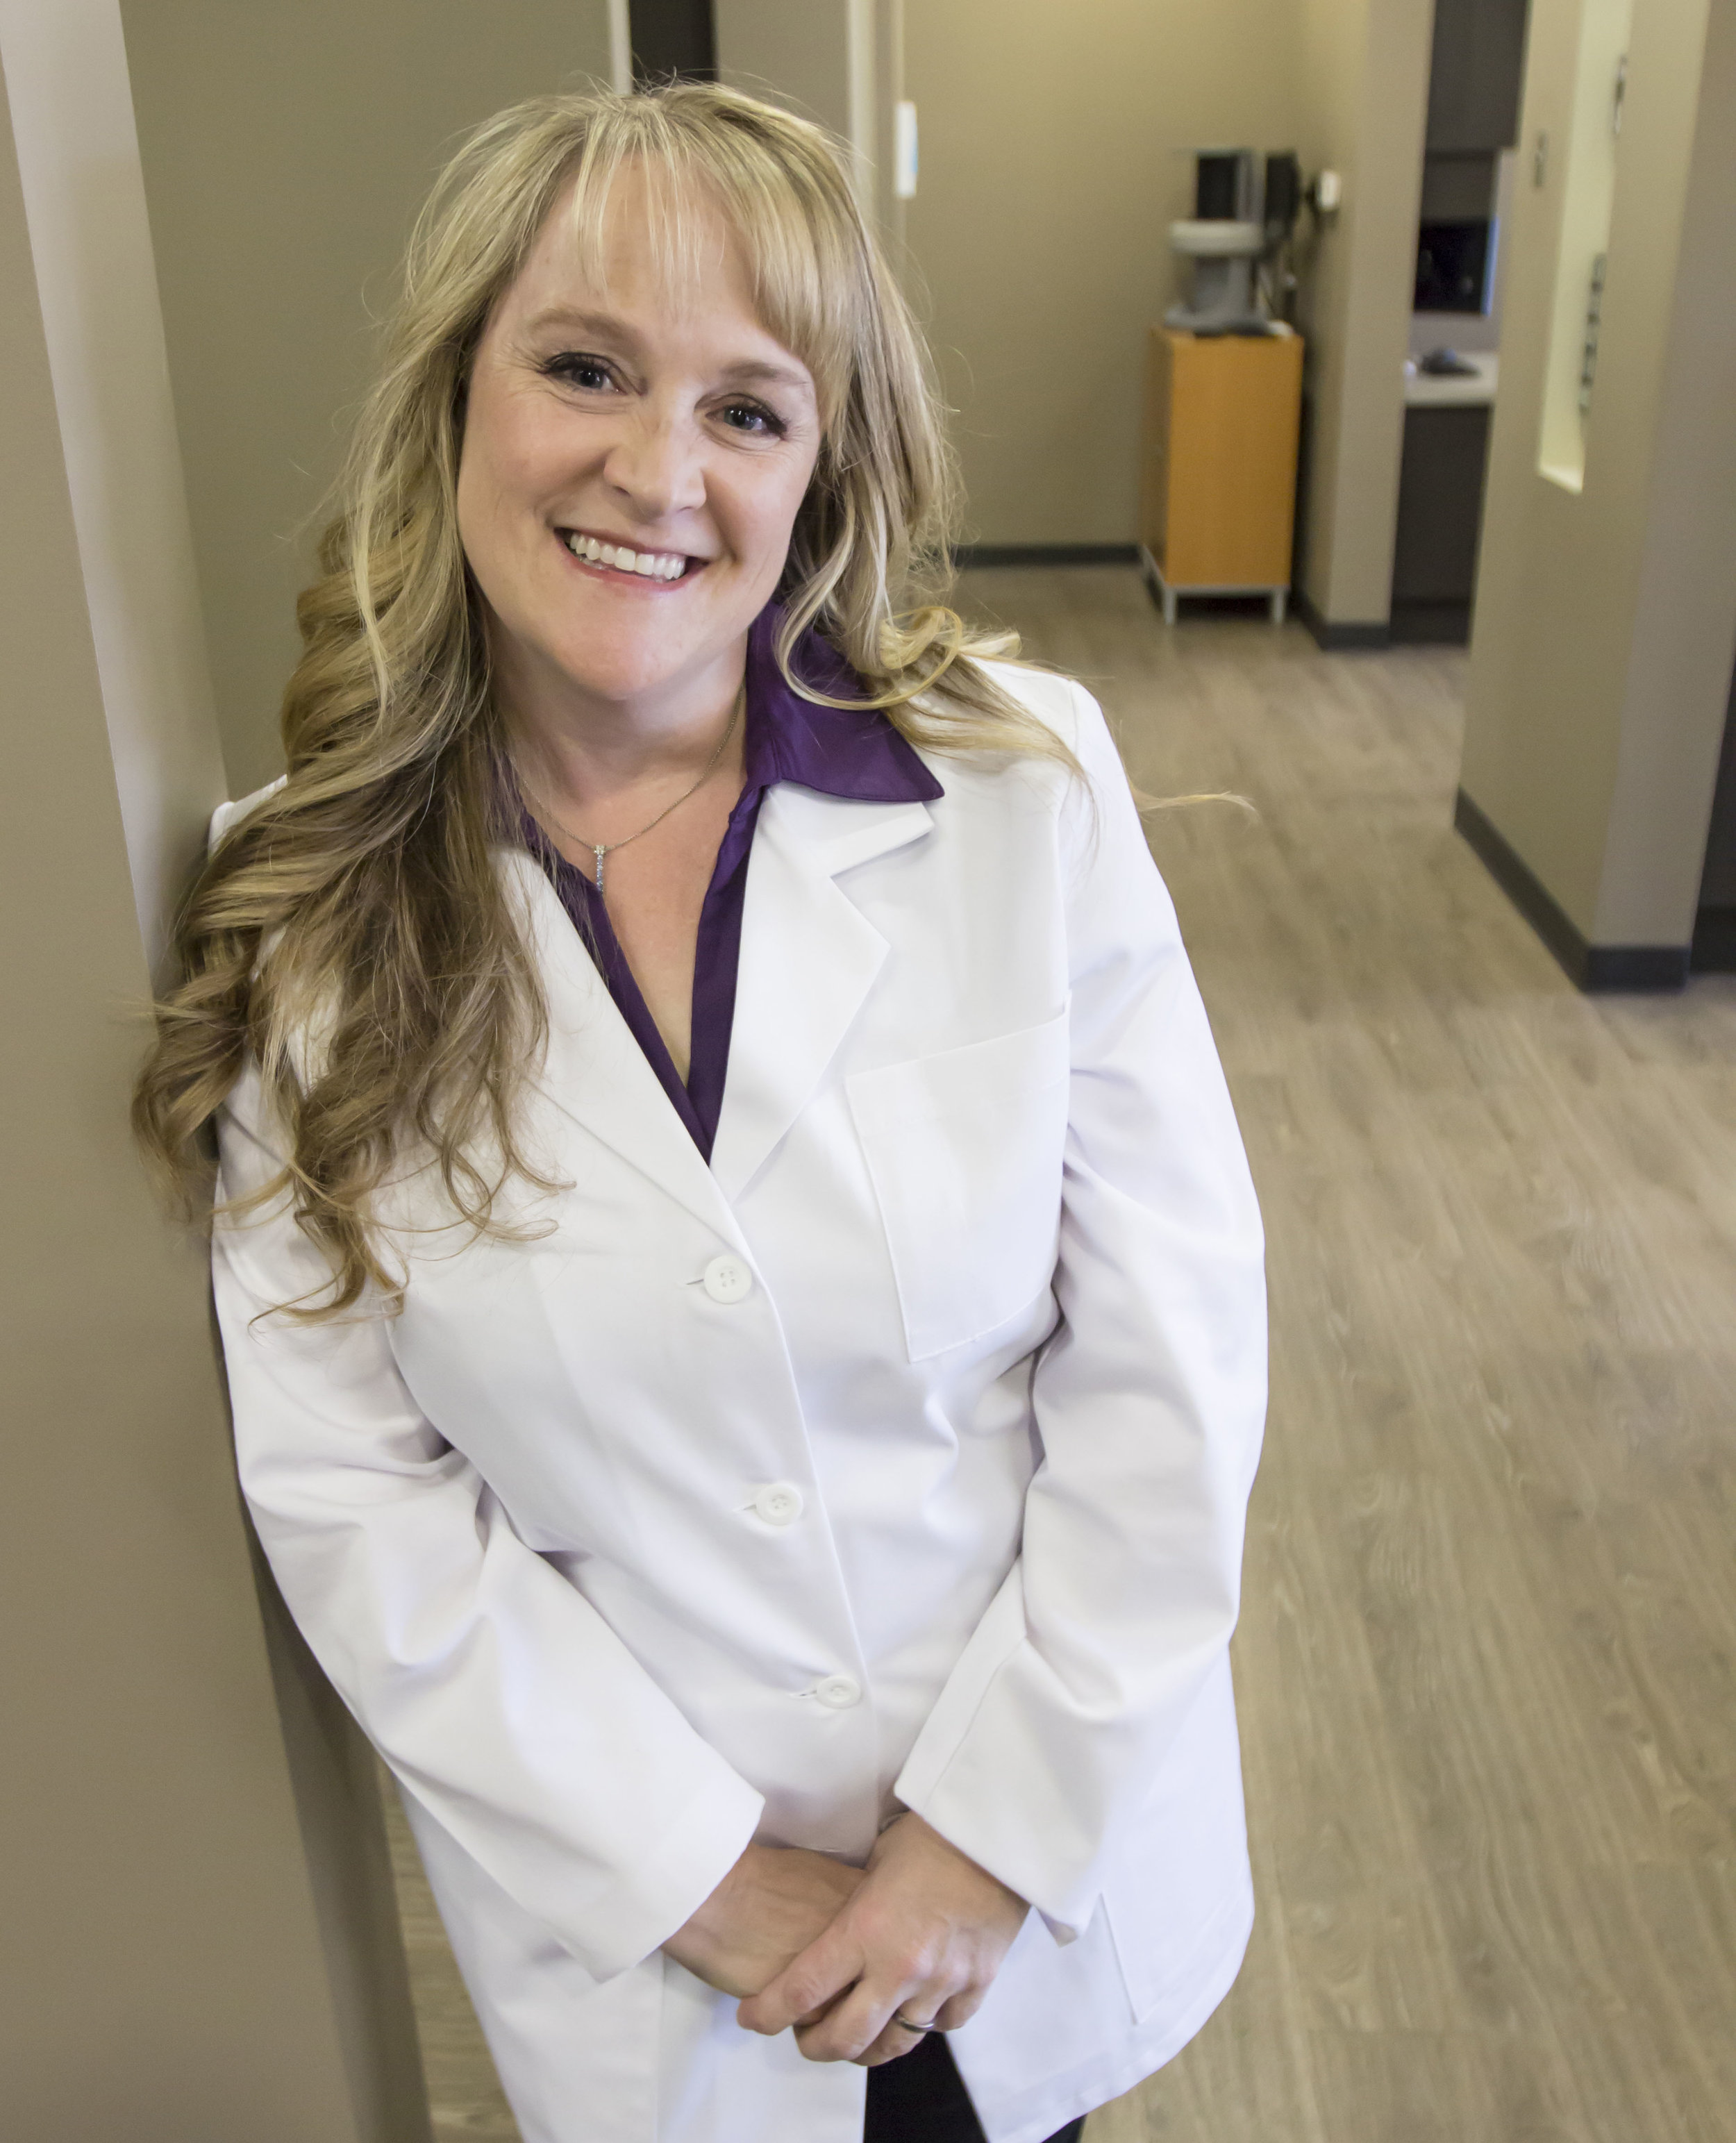 Meet Dr. Rebecca Temp at Mountain View Family Dental in Mesa, AZ.